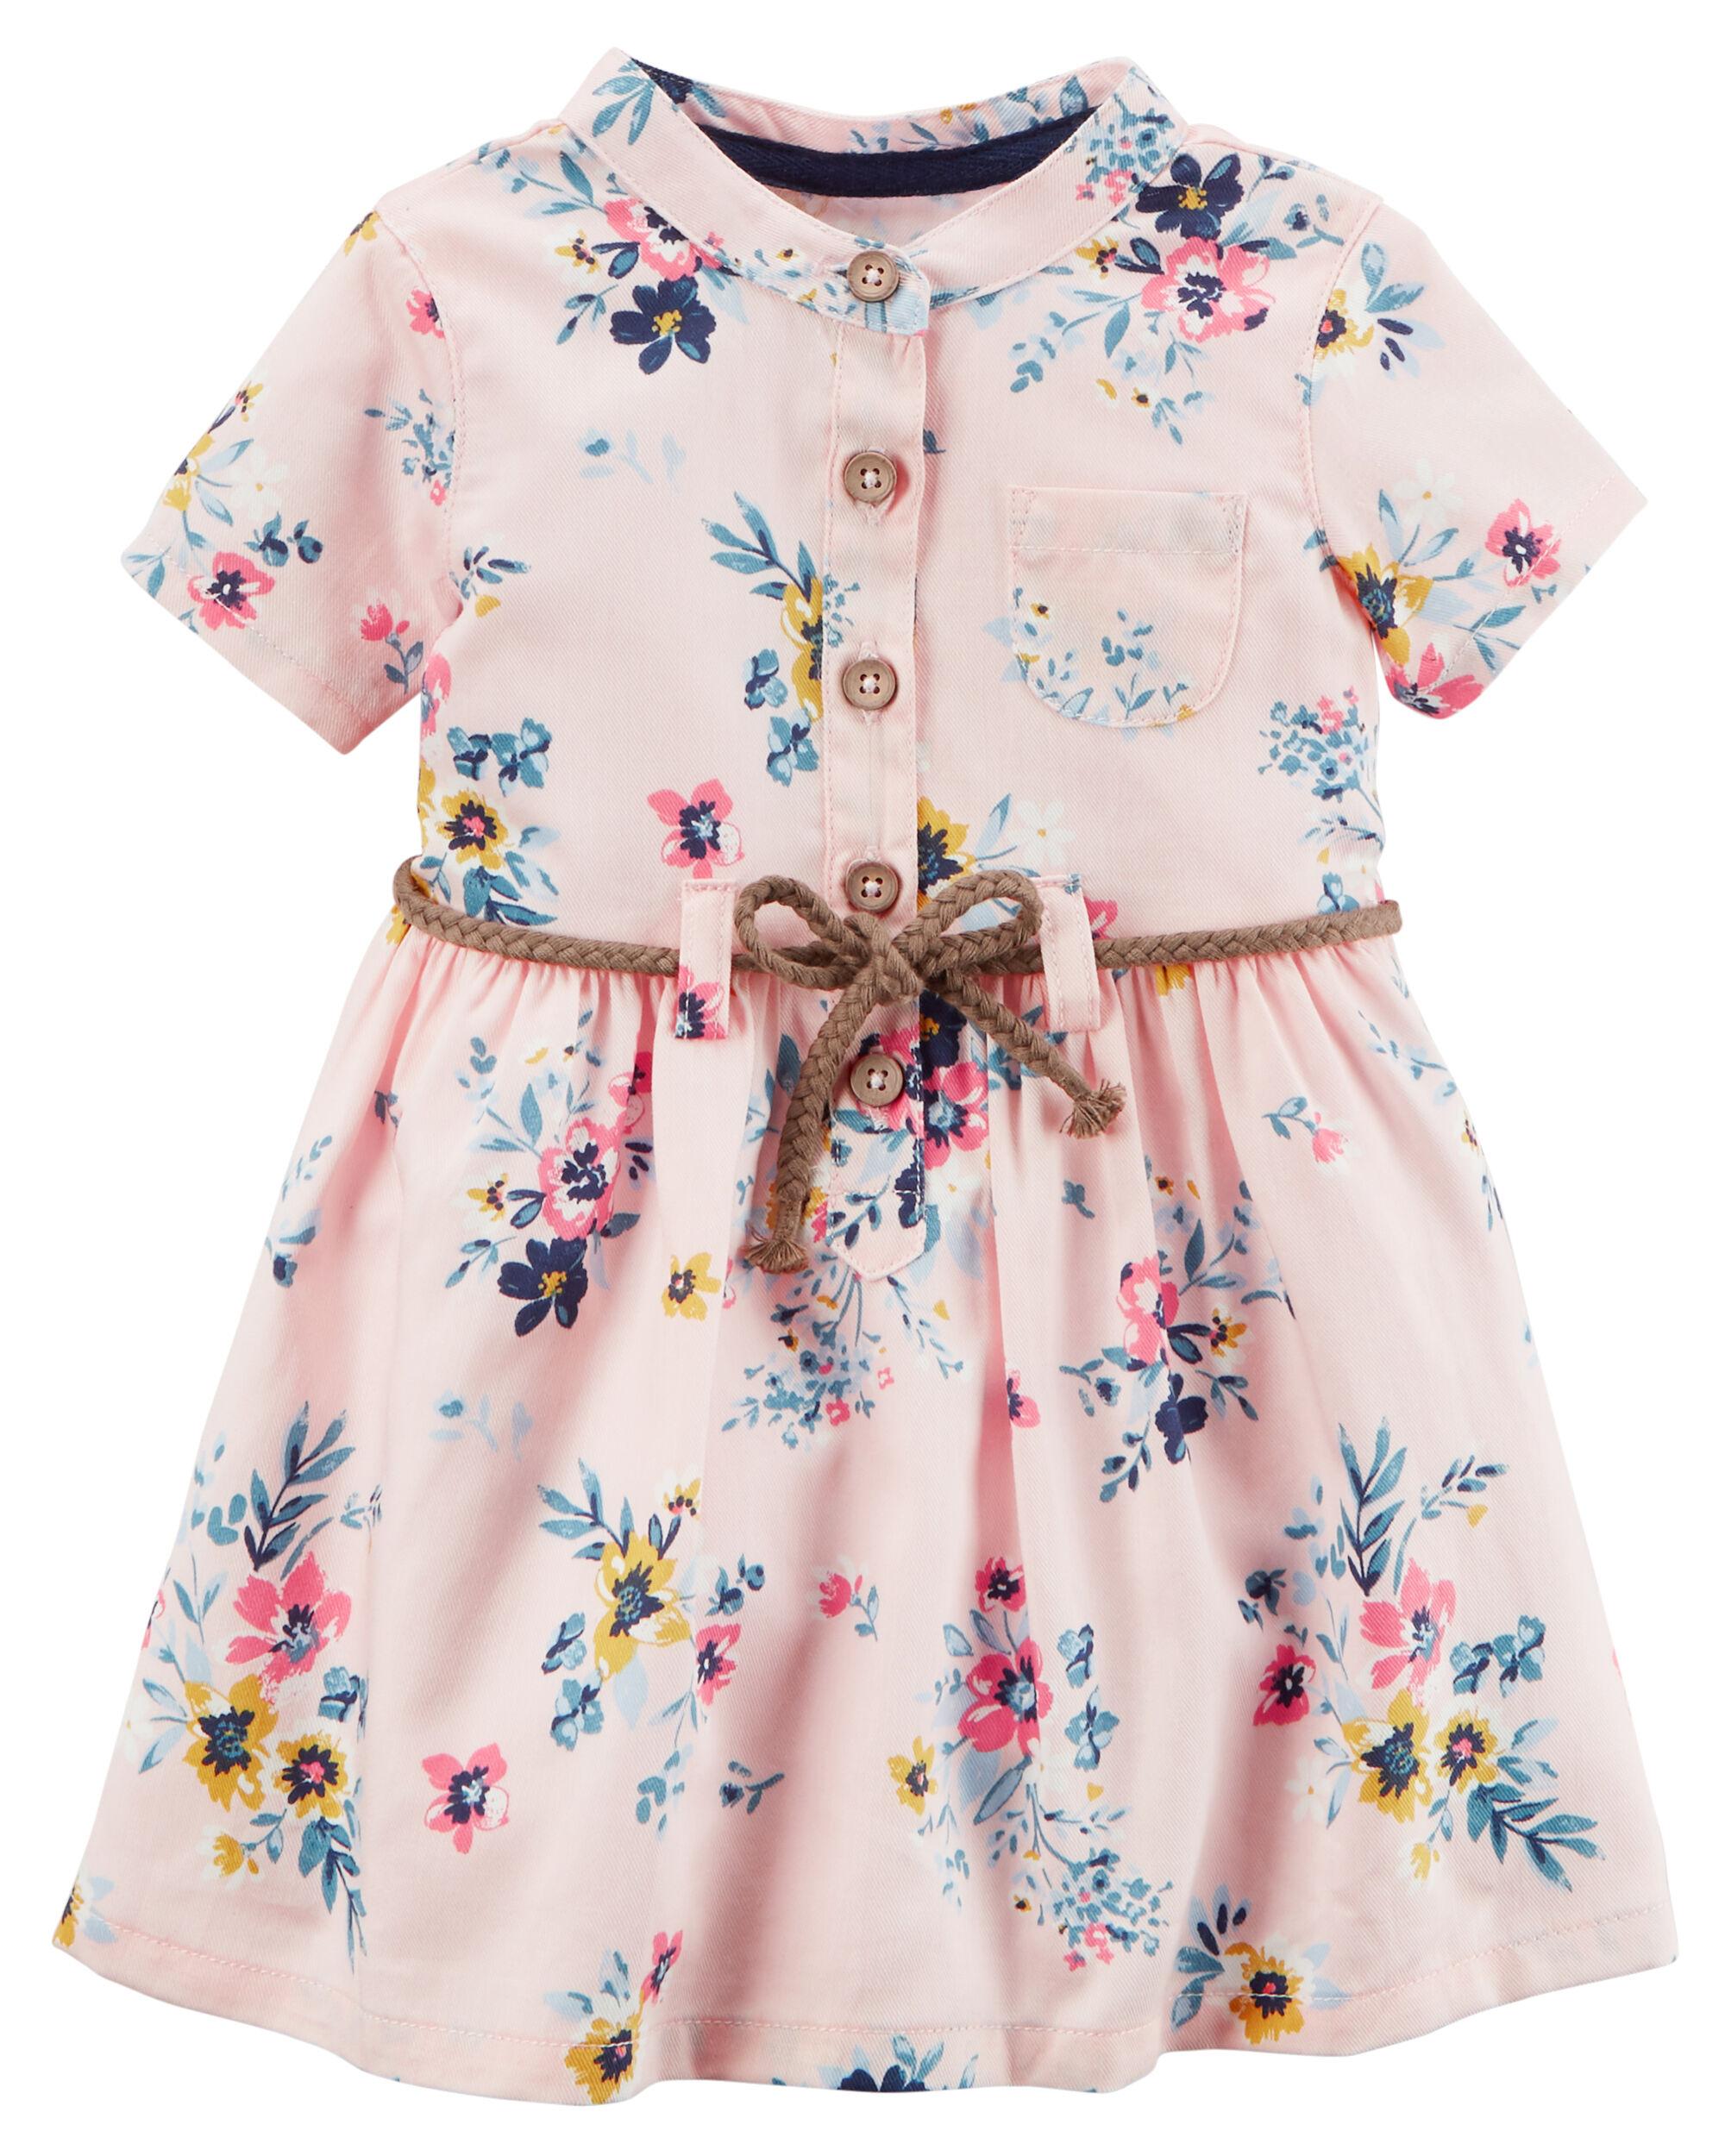 Floral Twill Shirt Dress | Carters.com